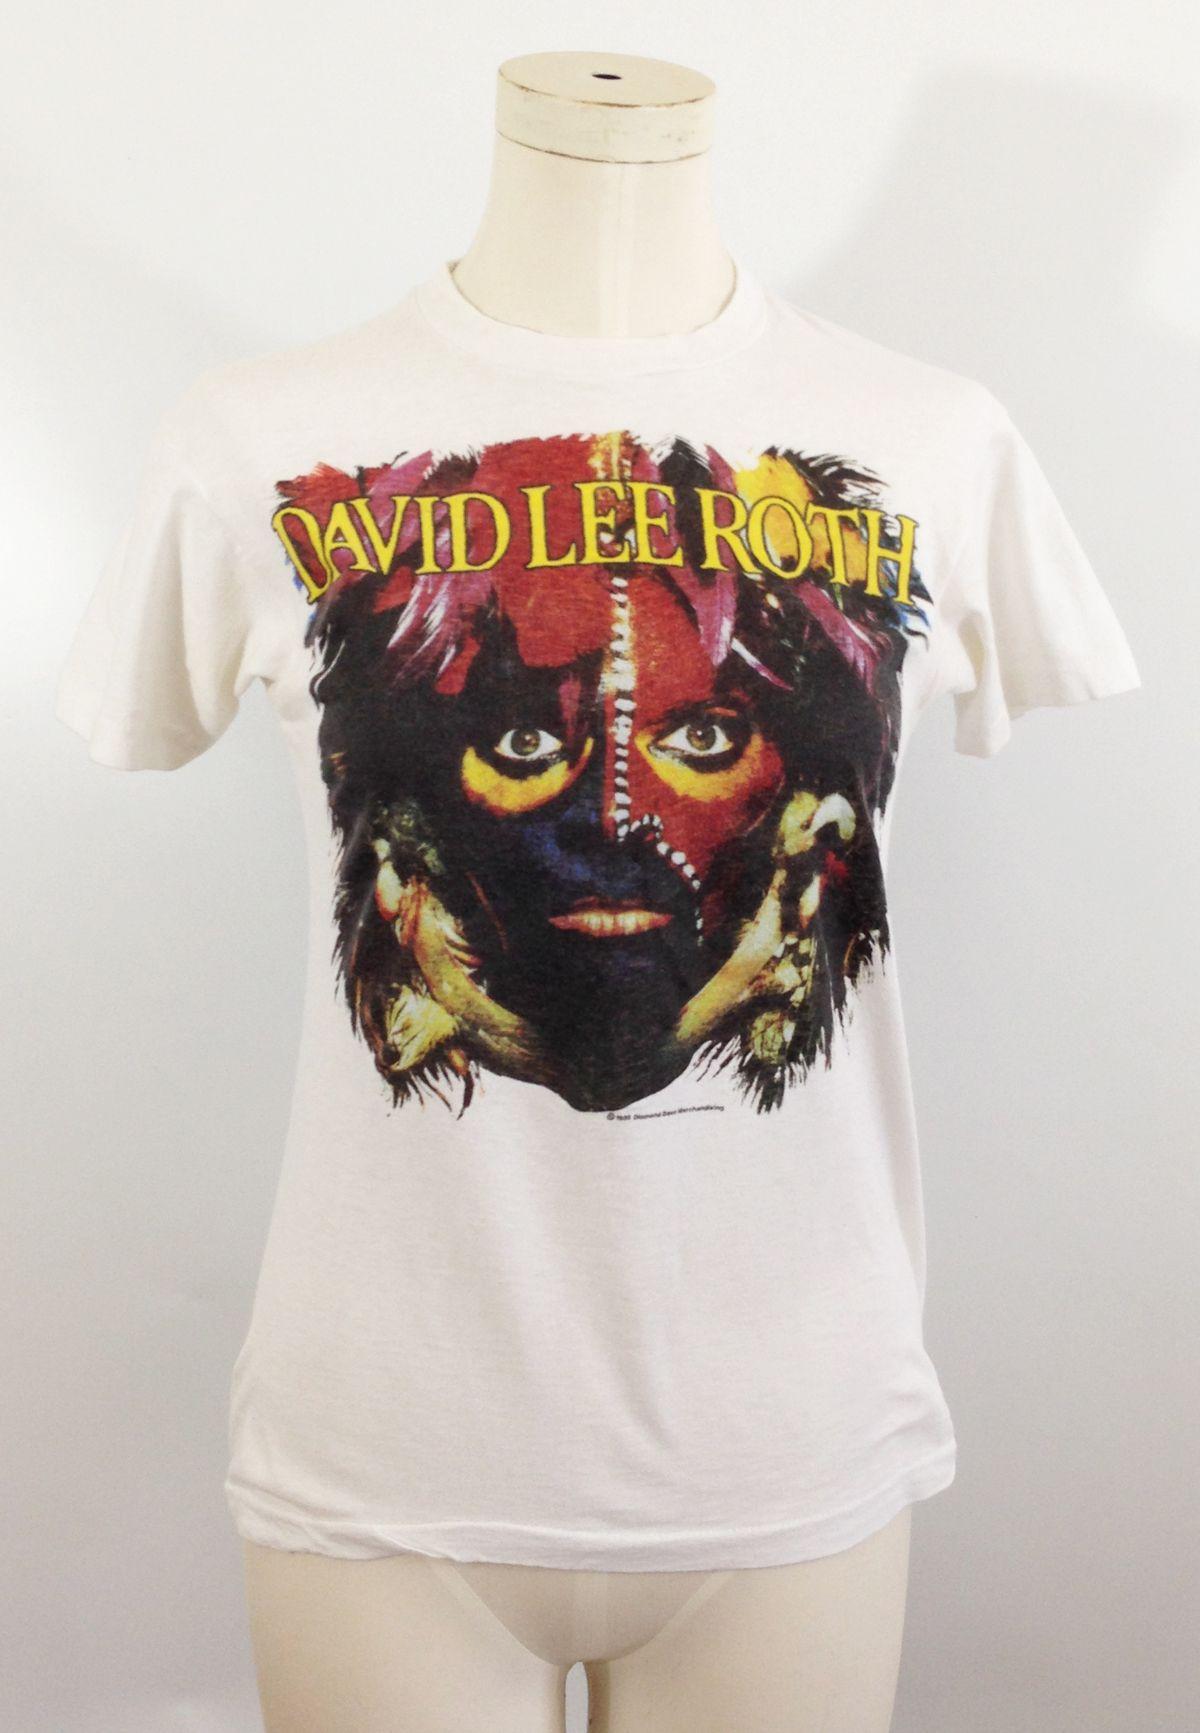 David Lee Roth Eat Em And Smile World Tour T Shirt Tour T Shirts T Shirt Shirts